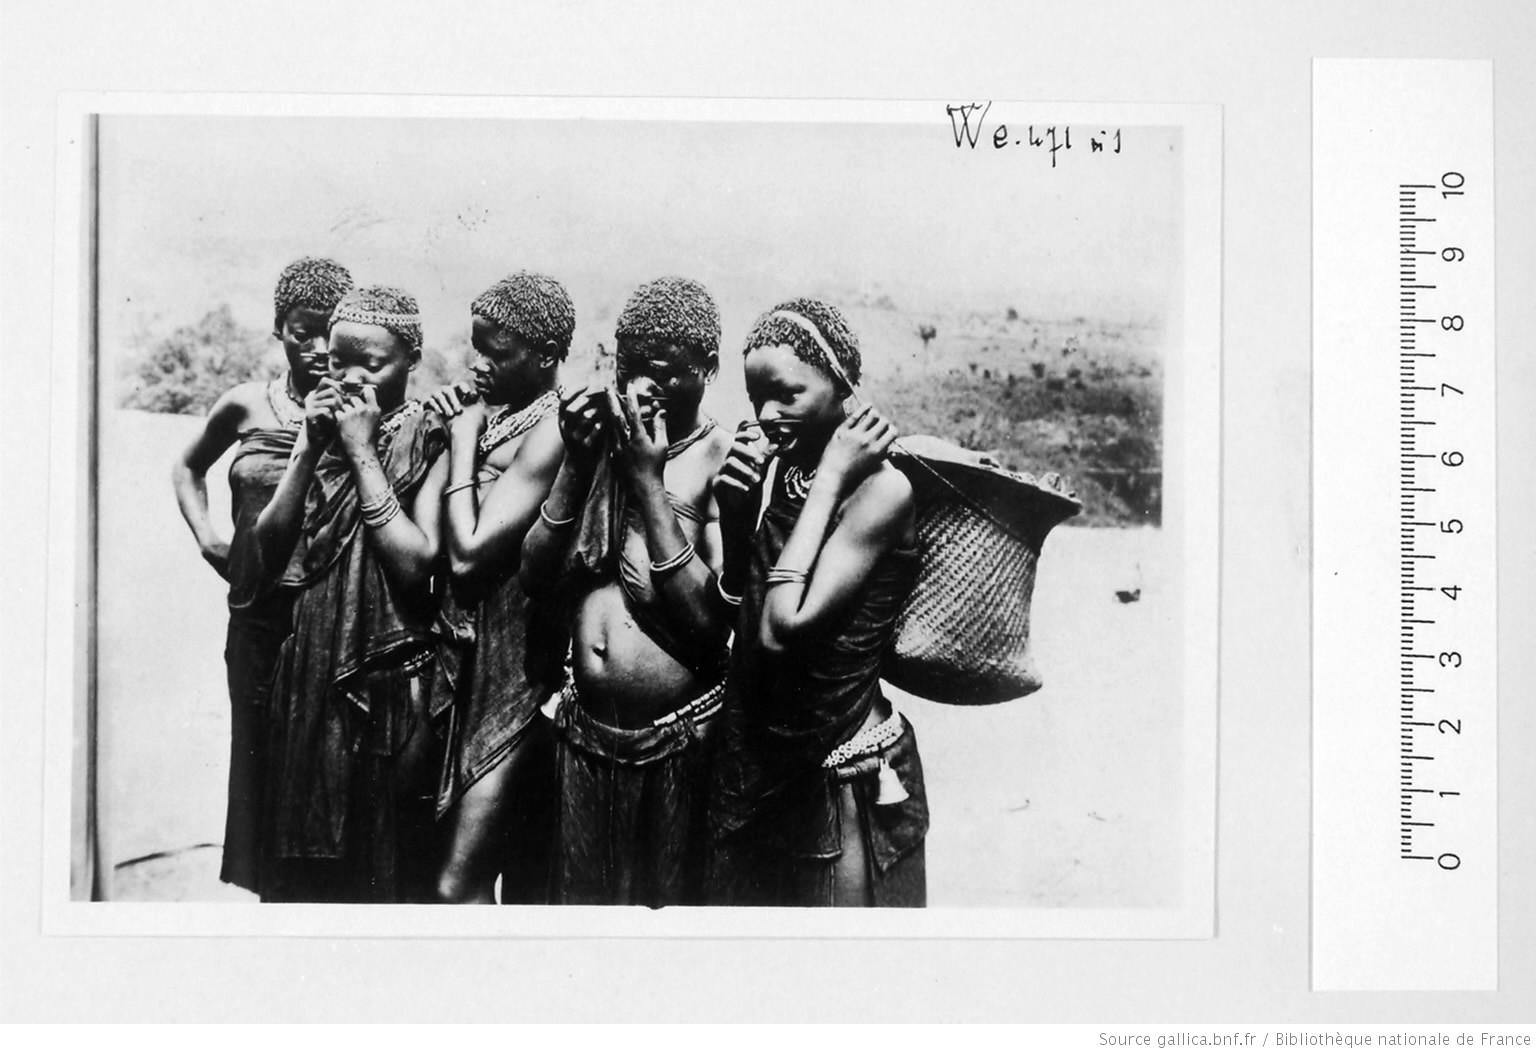 [39 phot. d'A.E.F. en 1924. Enregistré en 1936] 1924